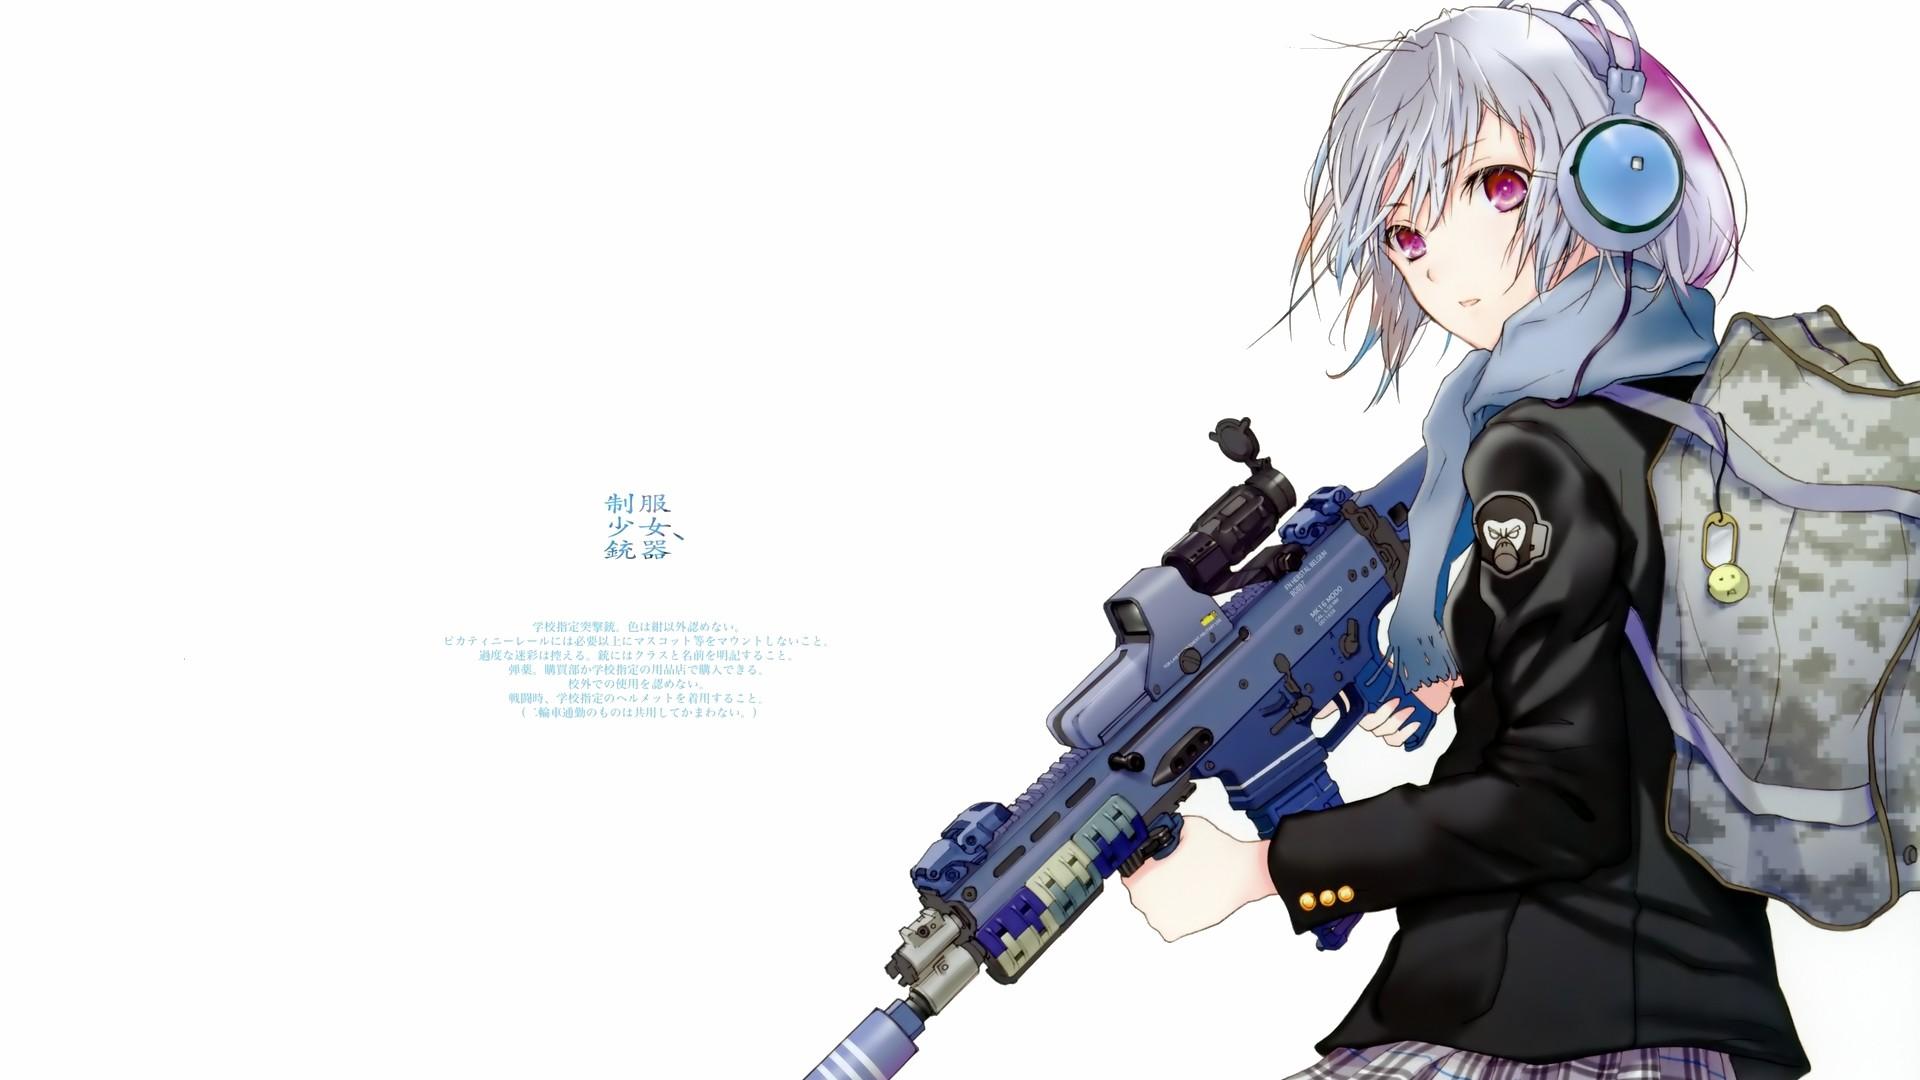 HD Anime FHDQ Wallpaper Desktop